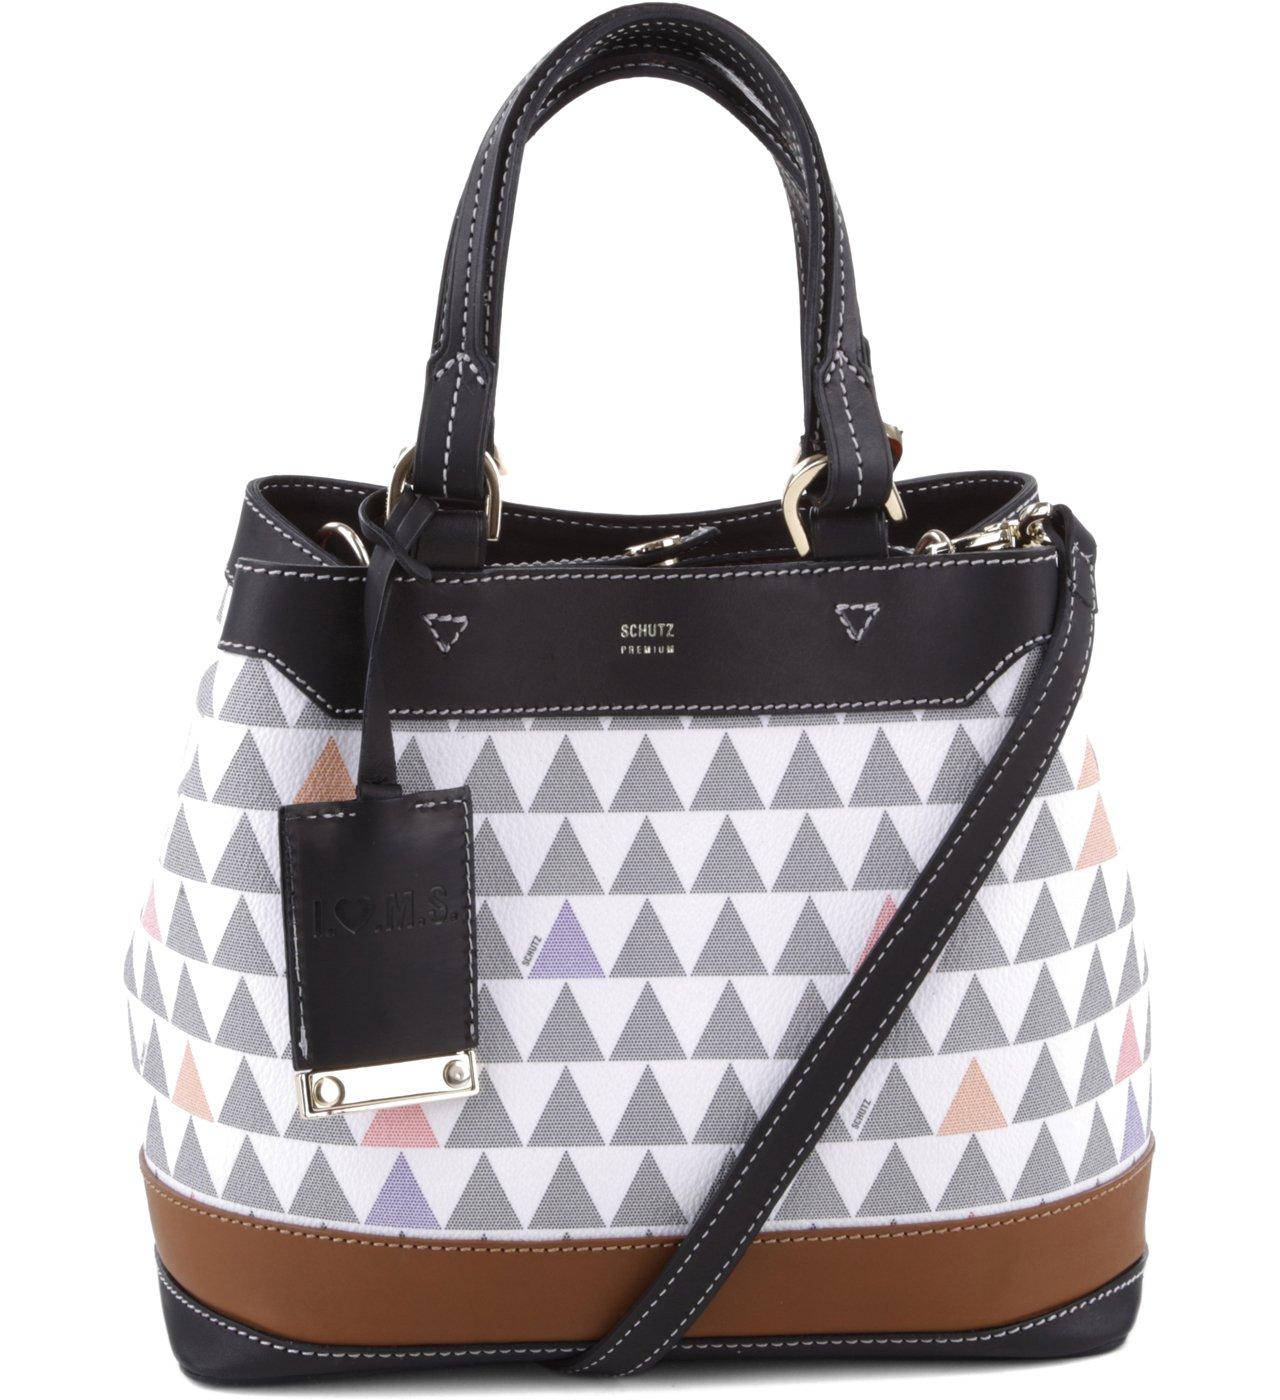 090f76acc Mini Emma Triangle Pearl - Personalização Bag Charm | Schutz